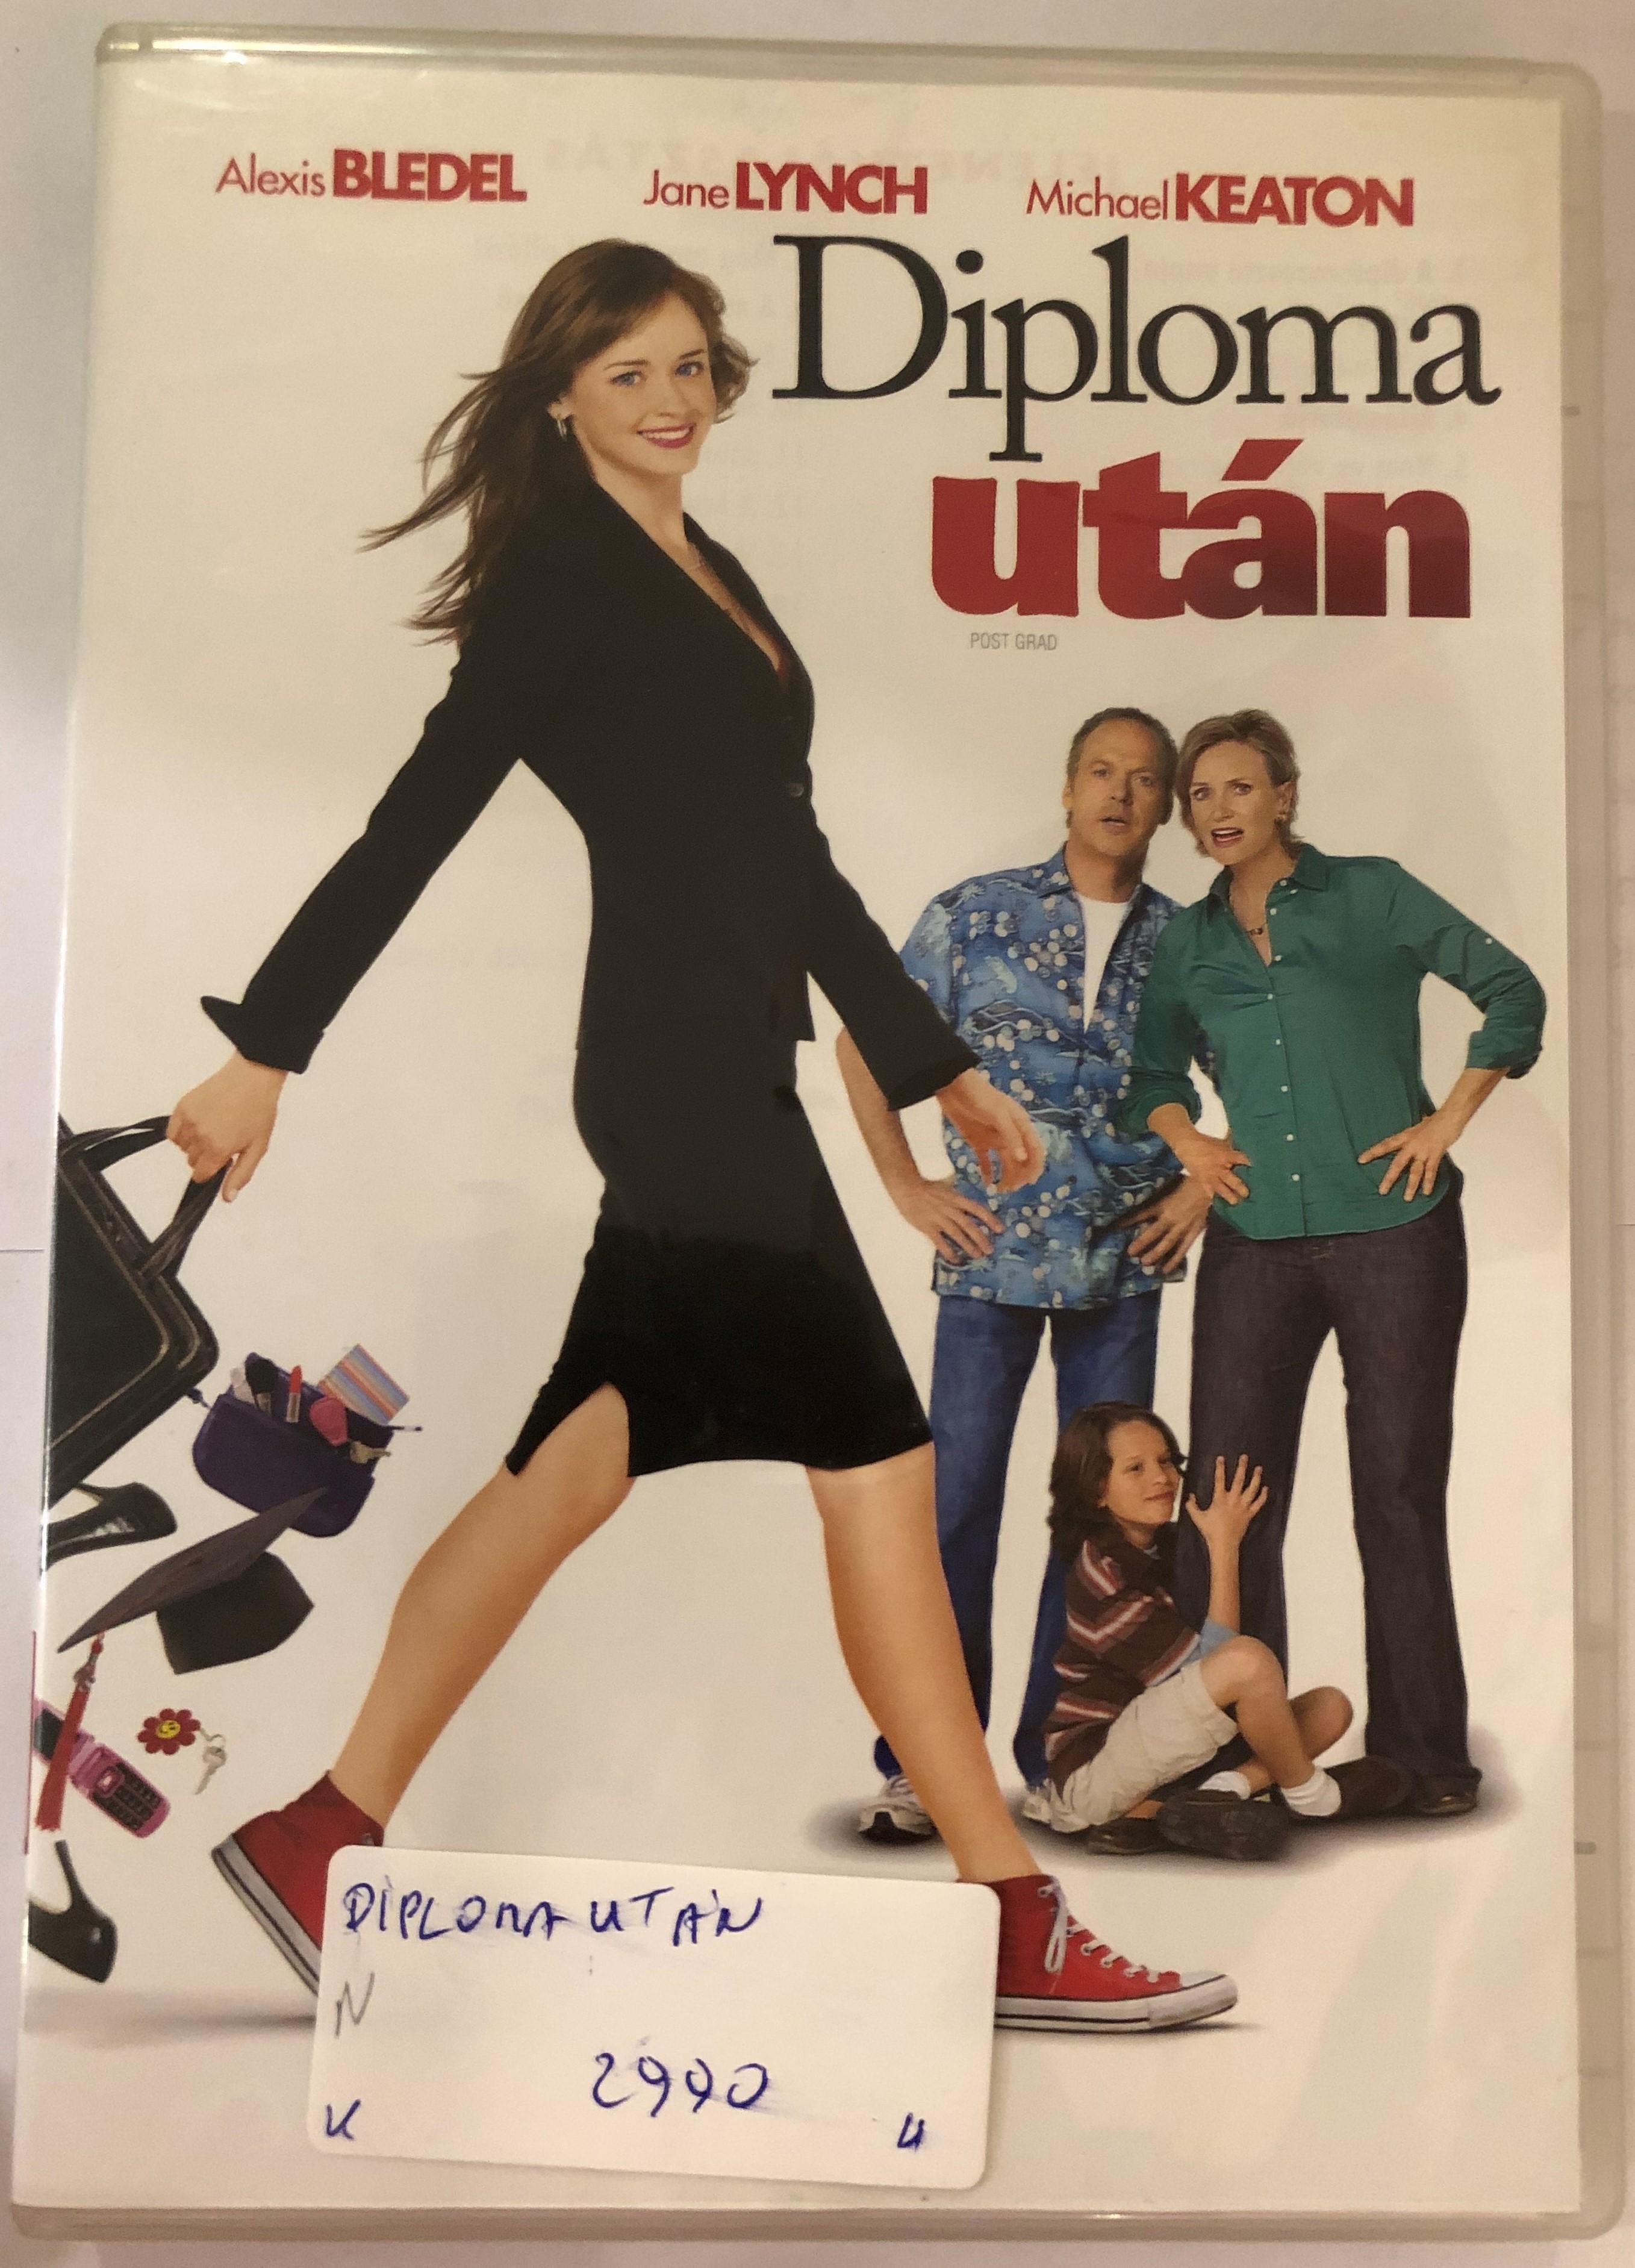 -post-grad-dvd-2009-diploma-ut-n-directed-by-vicky-jenson-1-.jpg